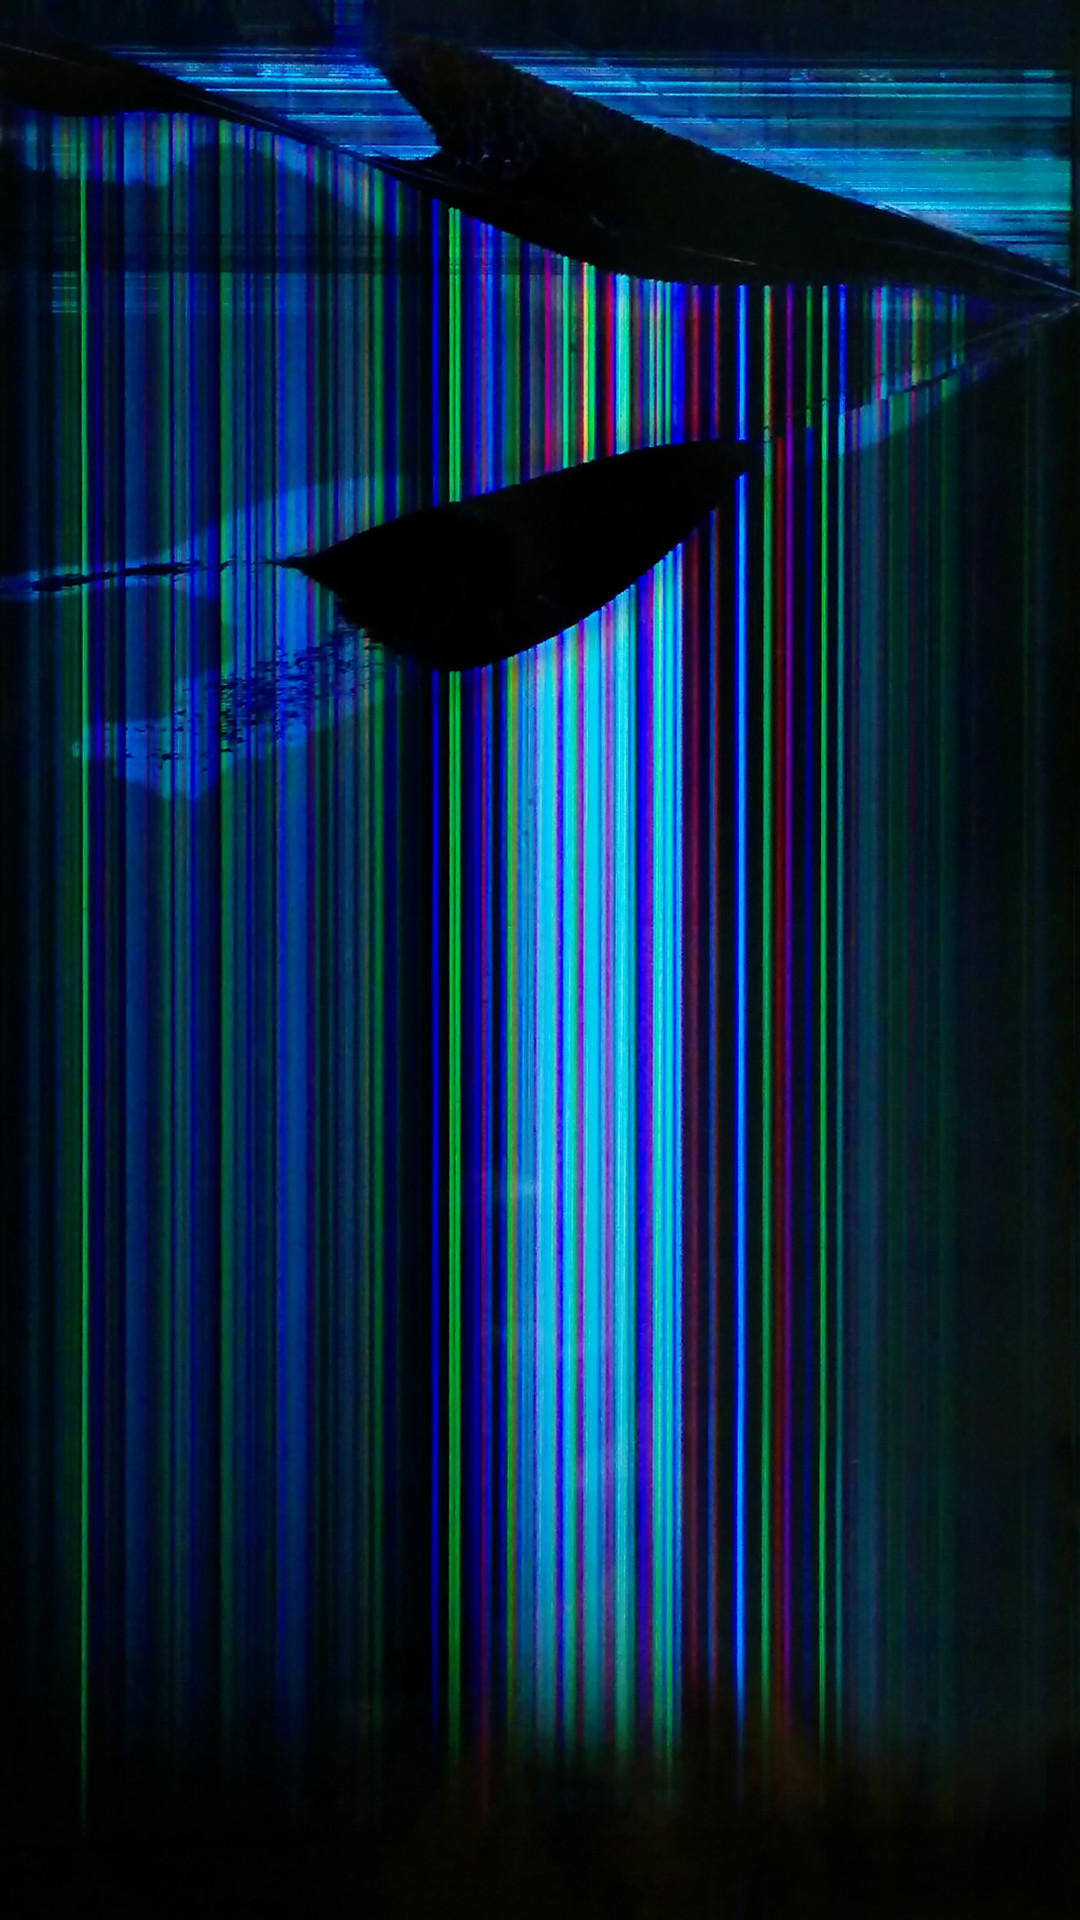 Amazing Wallpaper Home Screen Iphone 4s - 312062  Image_715644.jpg